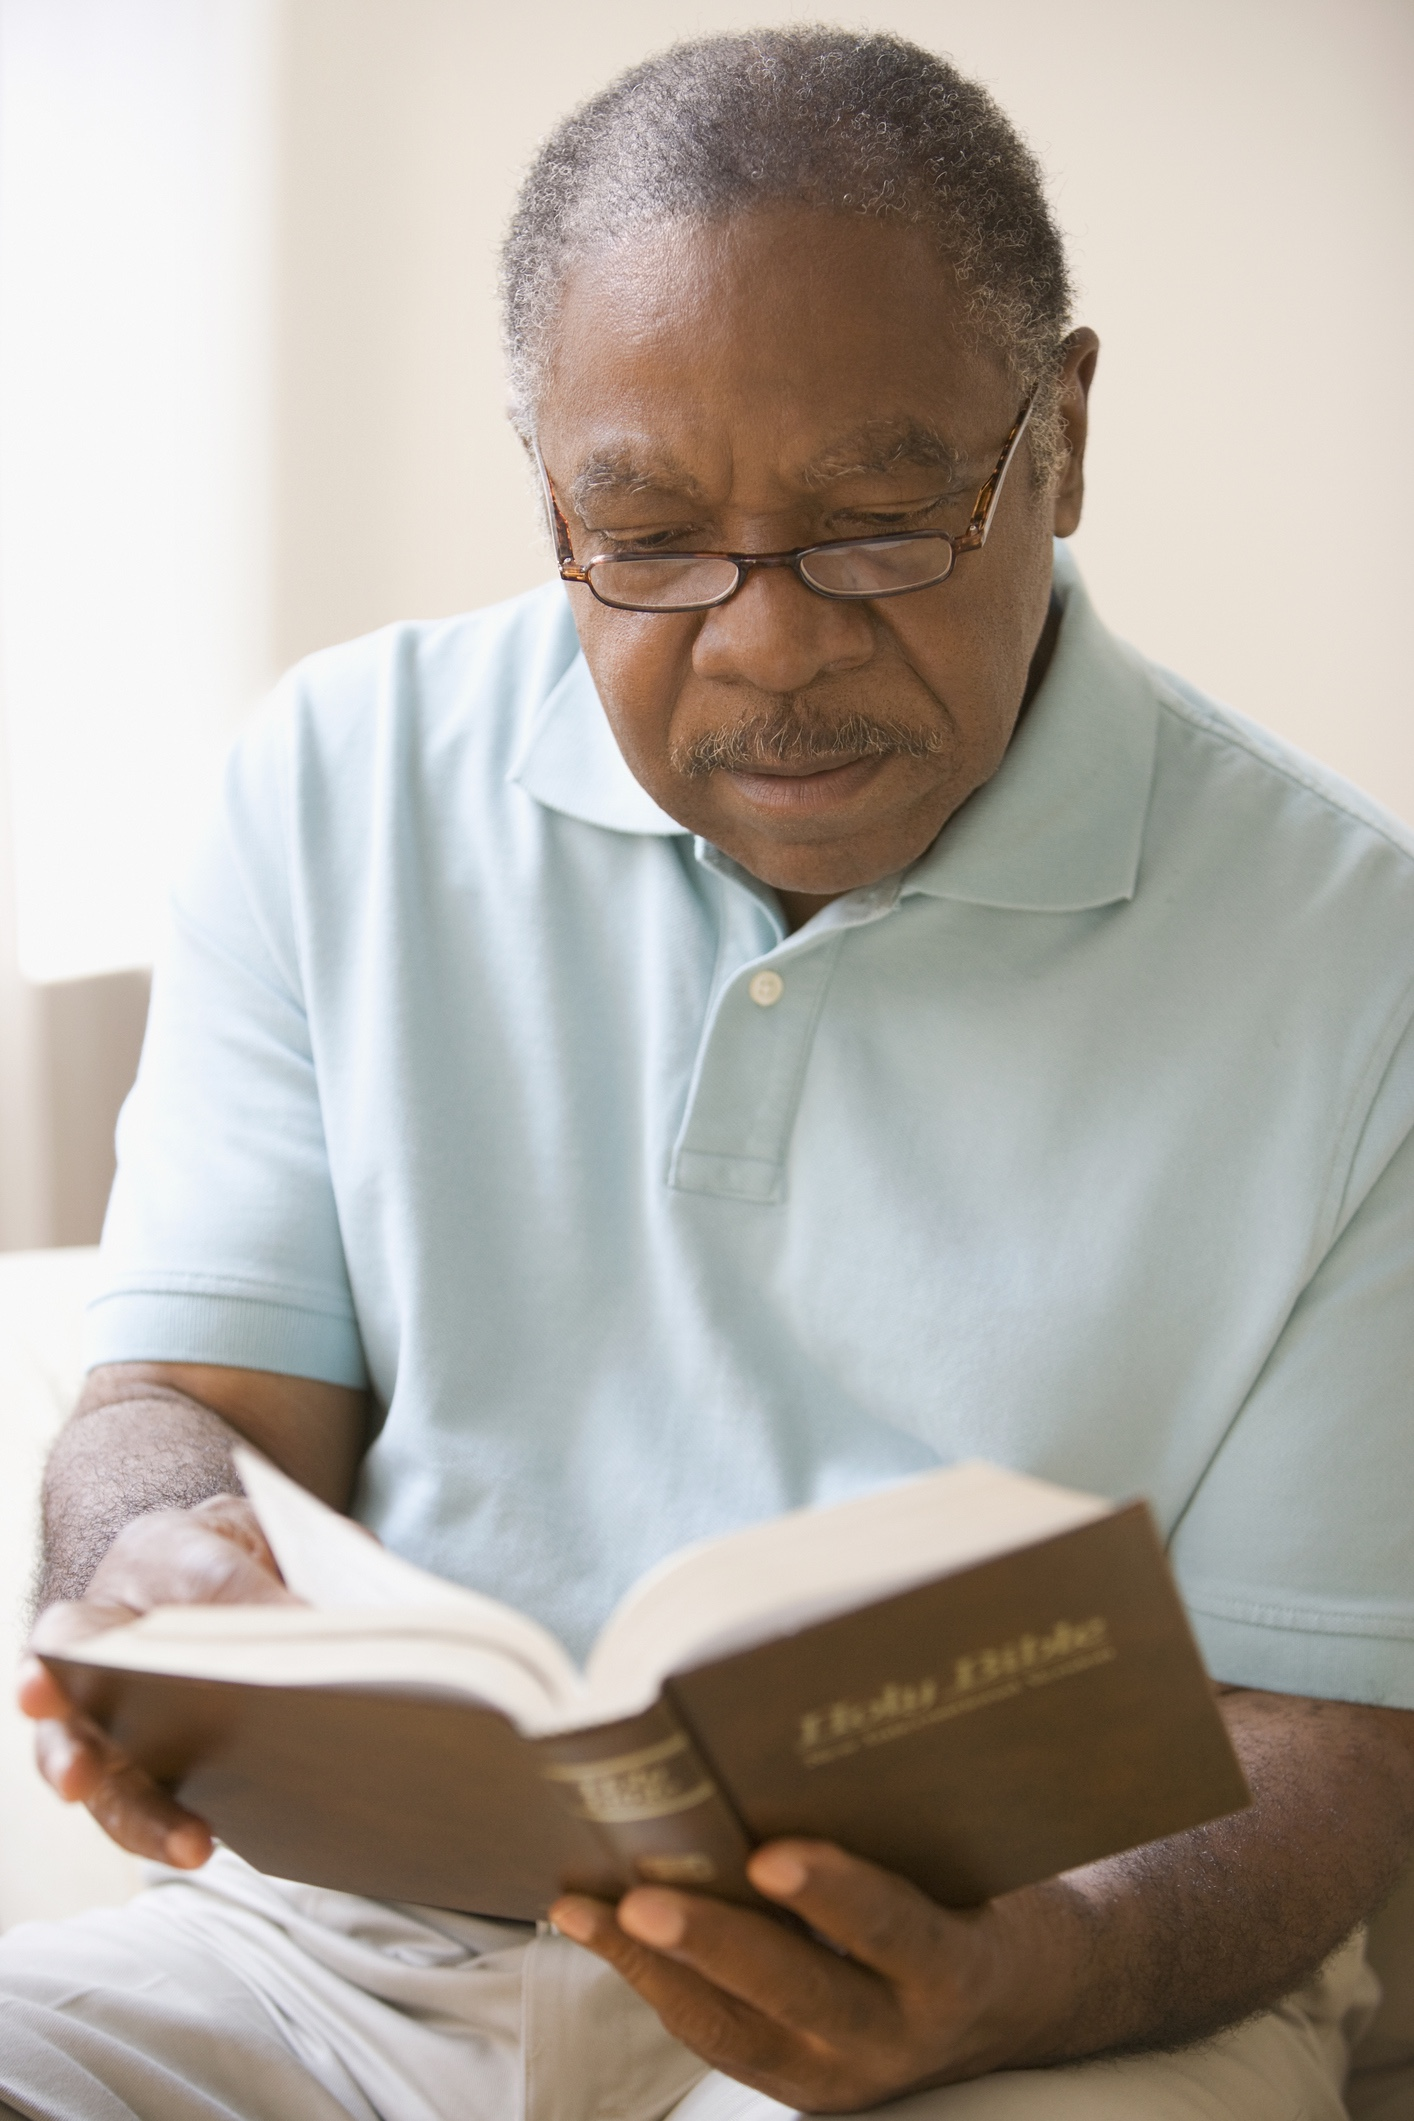 Mature as man scripture